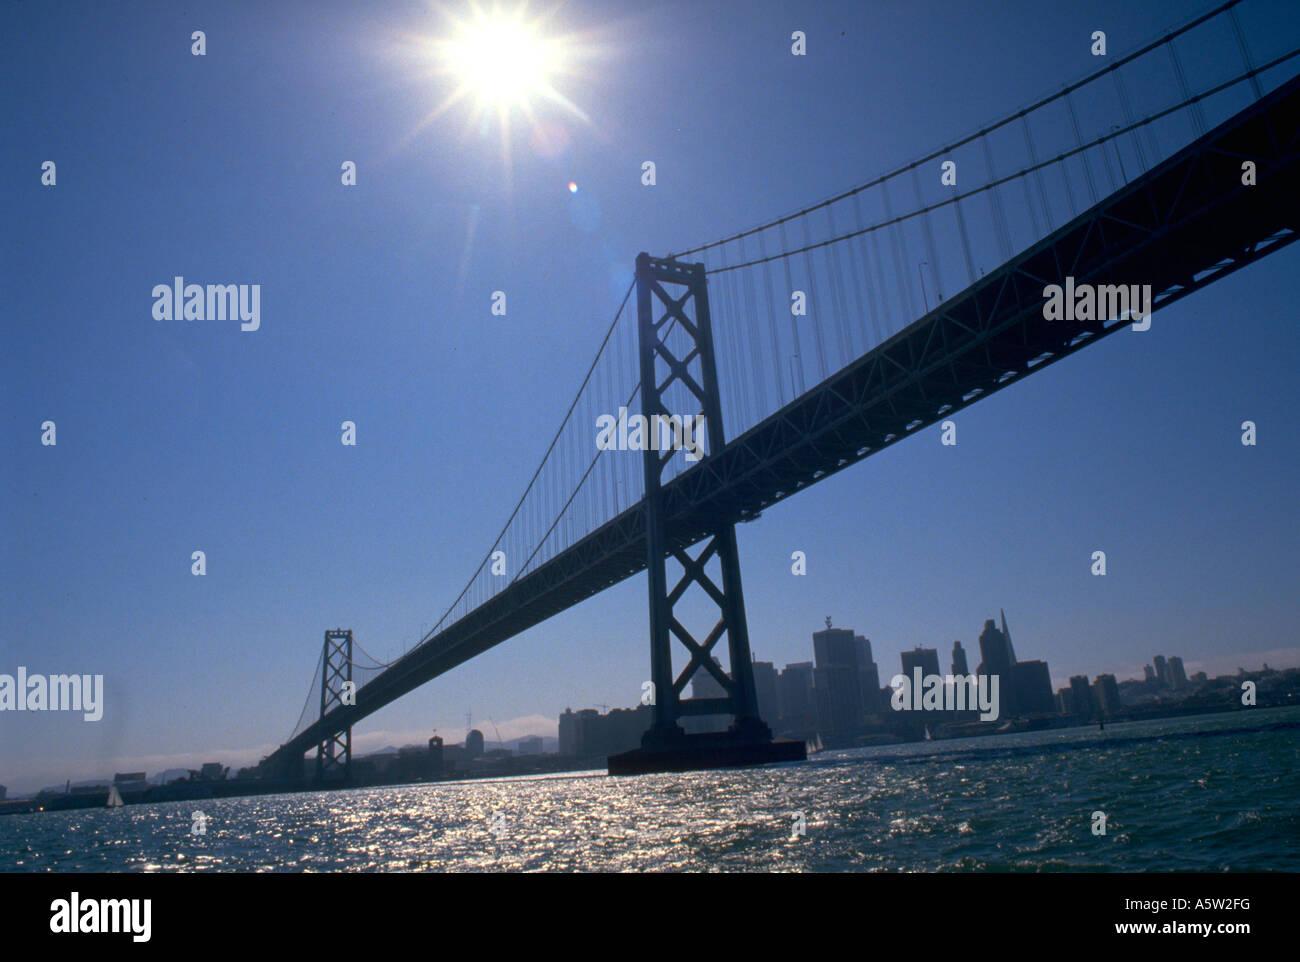 Painet hl1089 totale golden Gate San Francisco Kalifornien Bay bridge Stadtbild Skyline Wasser Wellen Sonne Sonnenlicht Stockbild